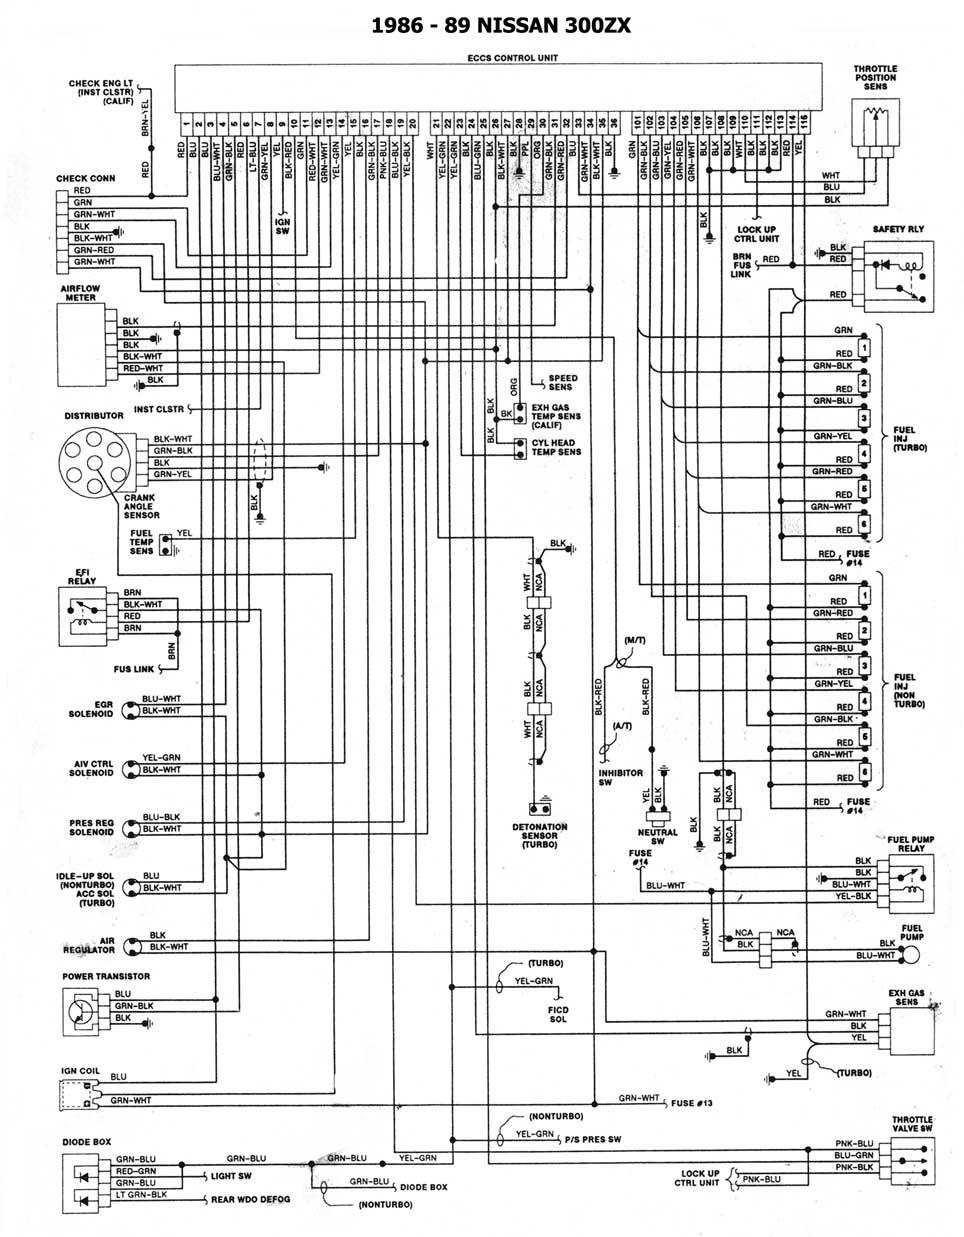 mazda 323 ignition wiring diagram infiniti g20 wiring